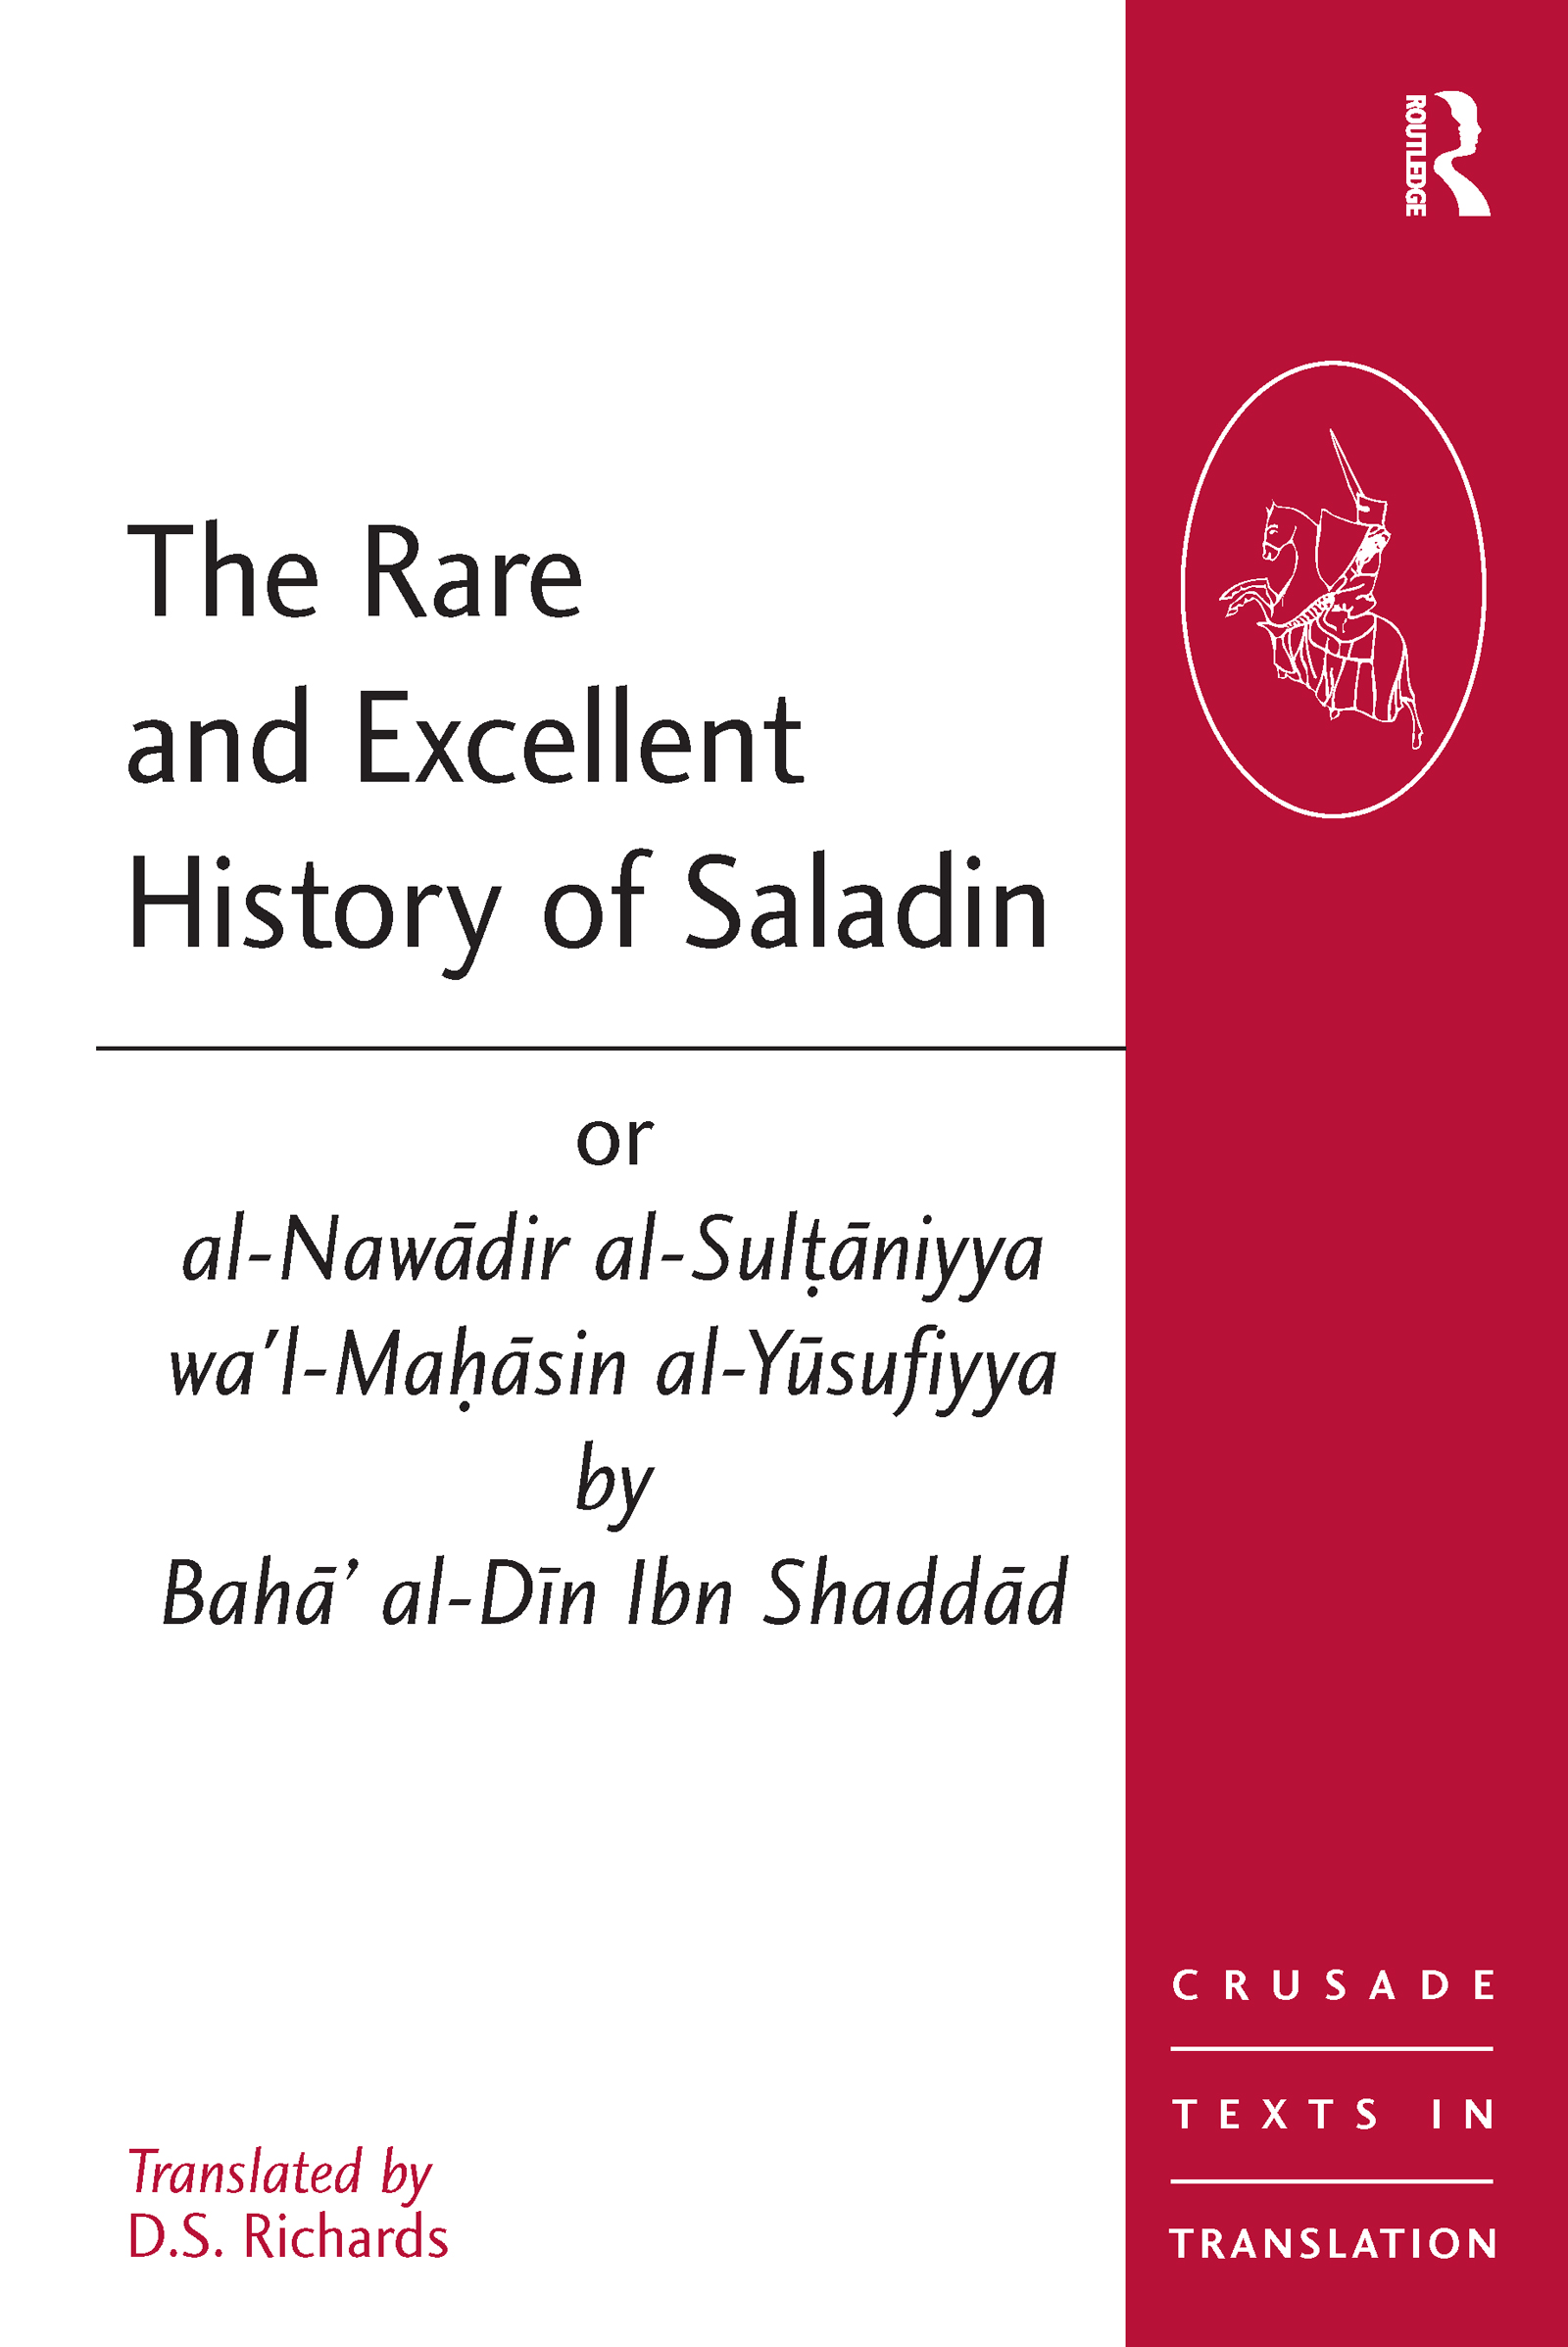 The Rare and Excellent History of Saladin or al-Nawadir al-Sultaniyya wa'l-Mahasin al-Yusufiyya by Baha' al-Din Ibn Shaddad